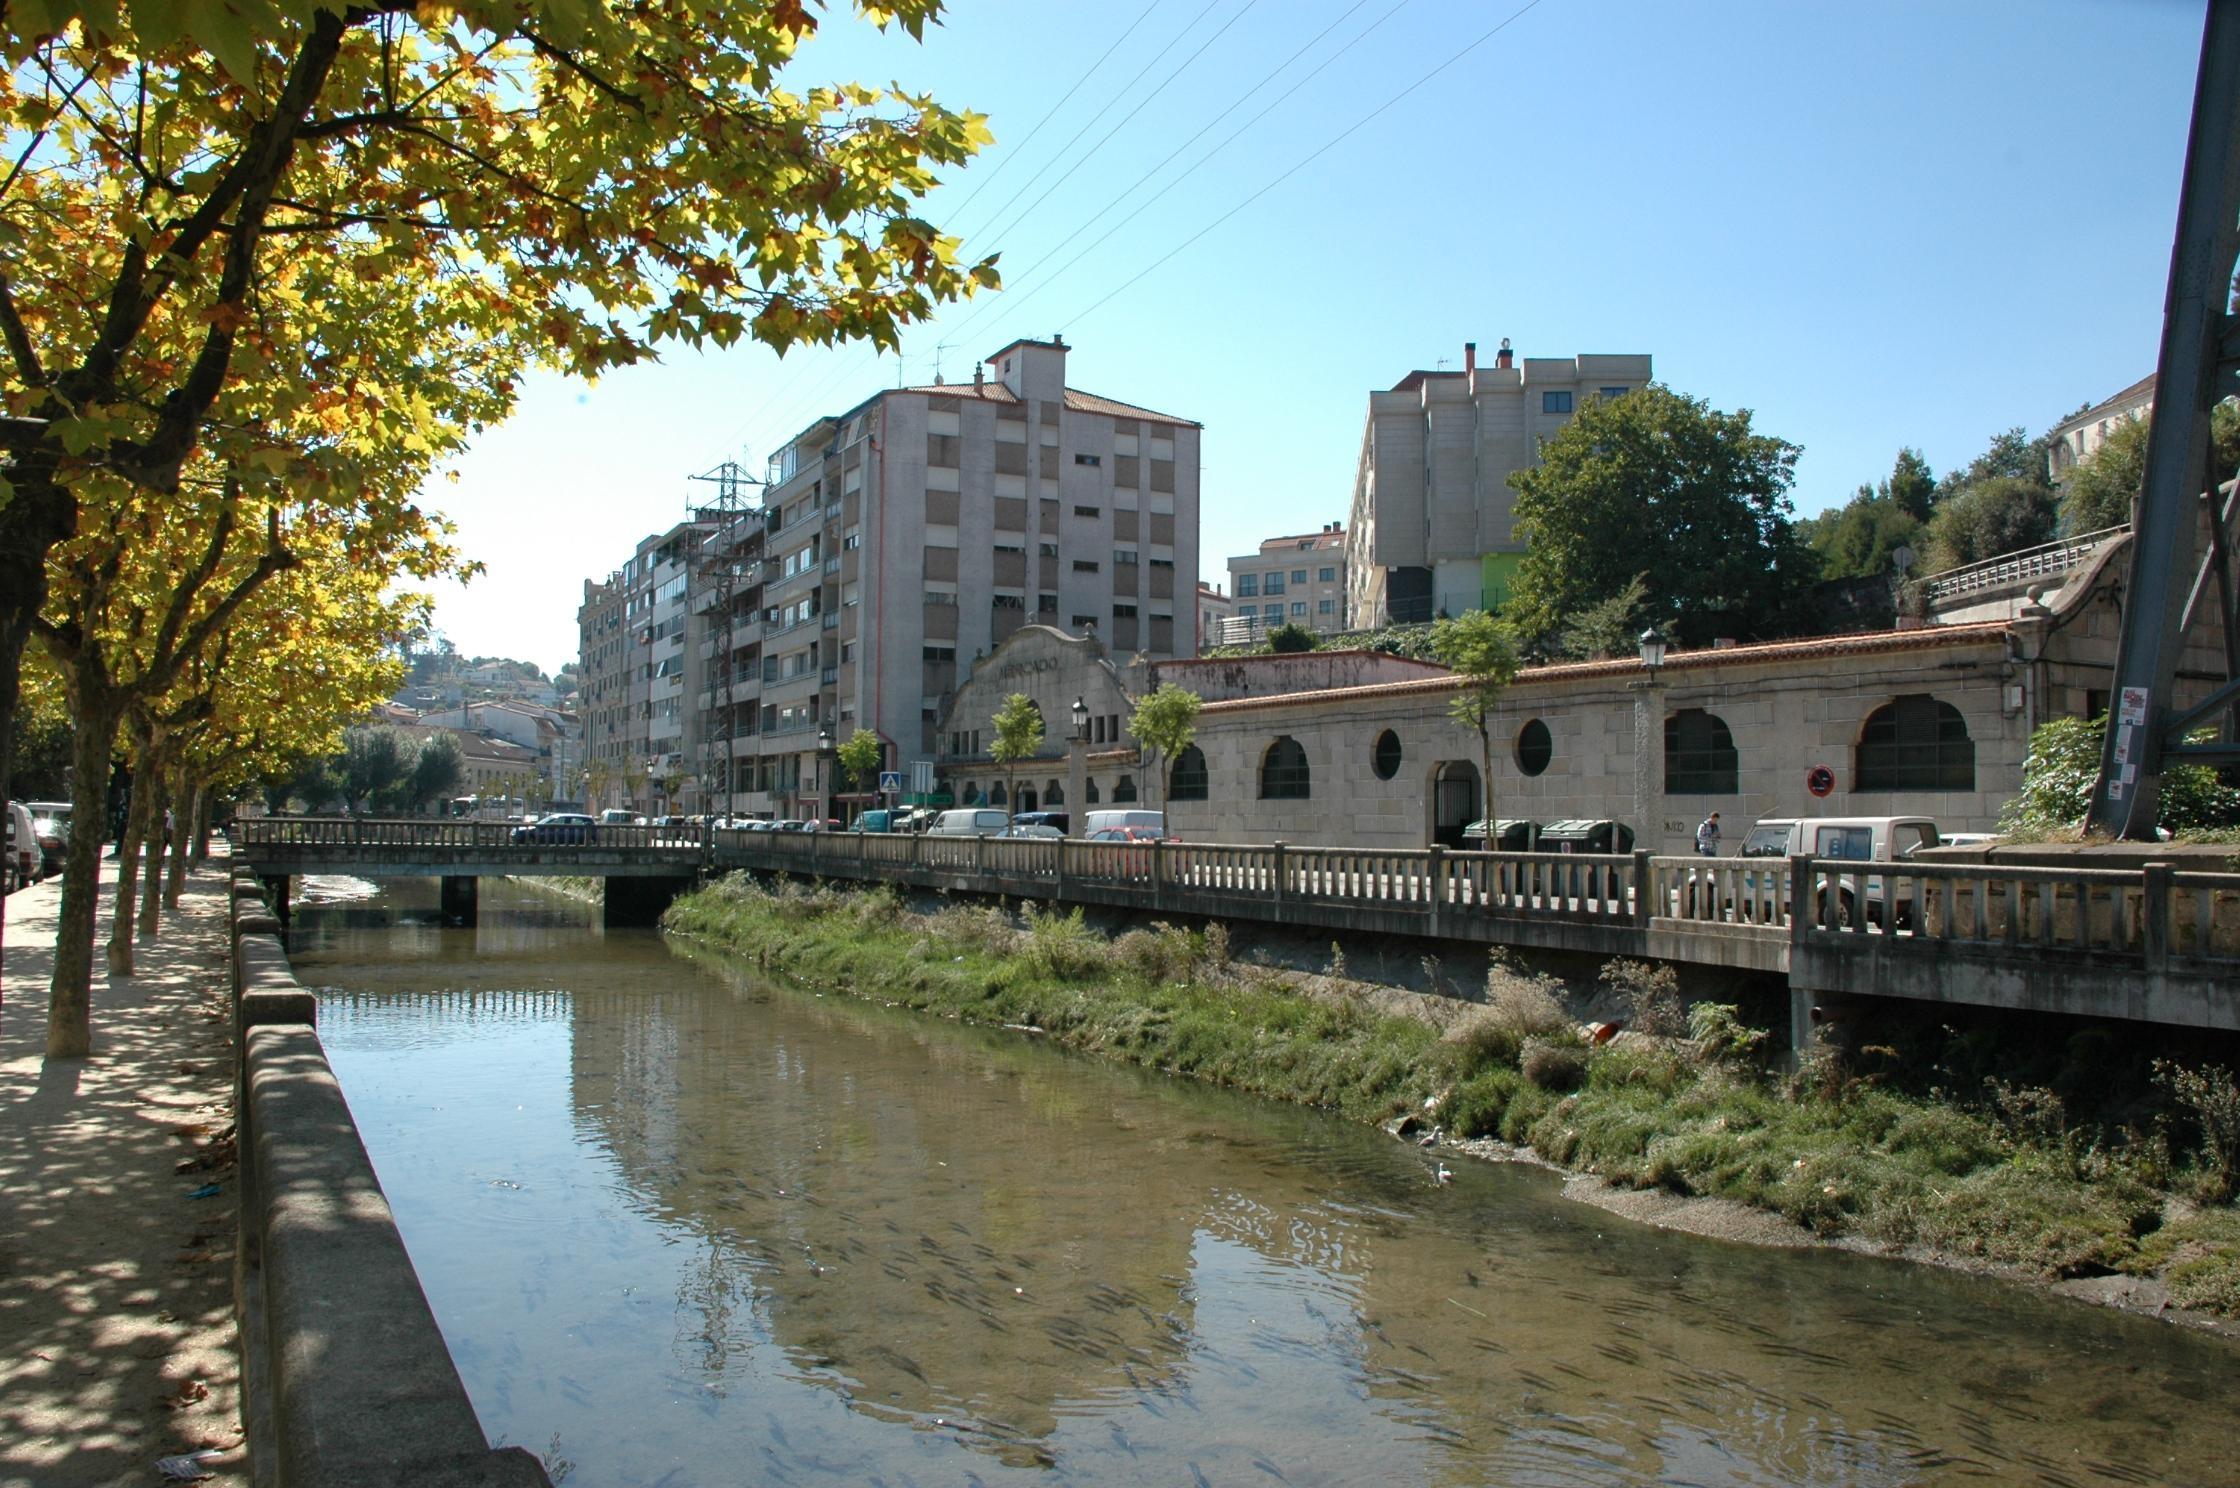 Plaza de Abastastos de Redondela